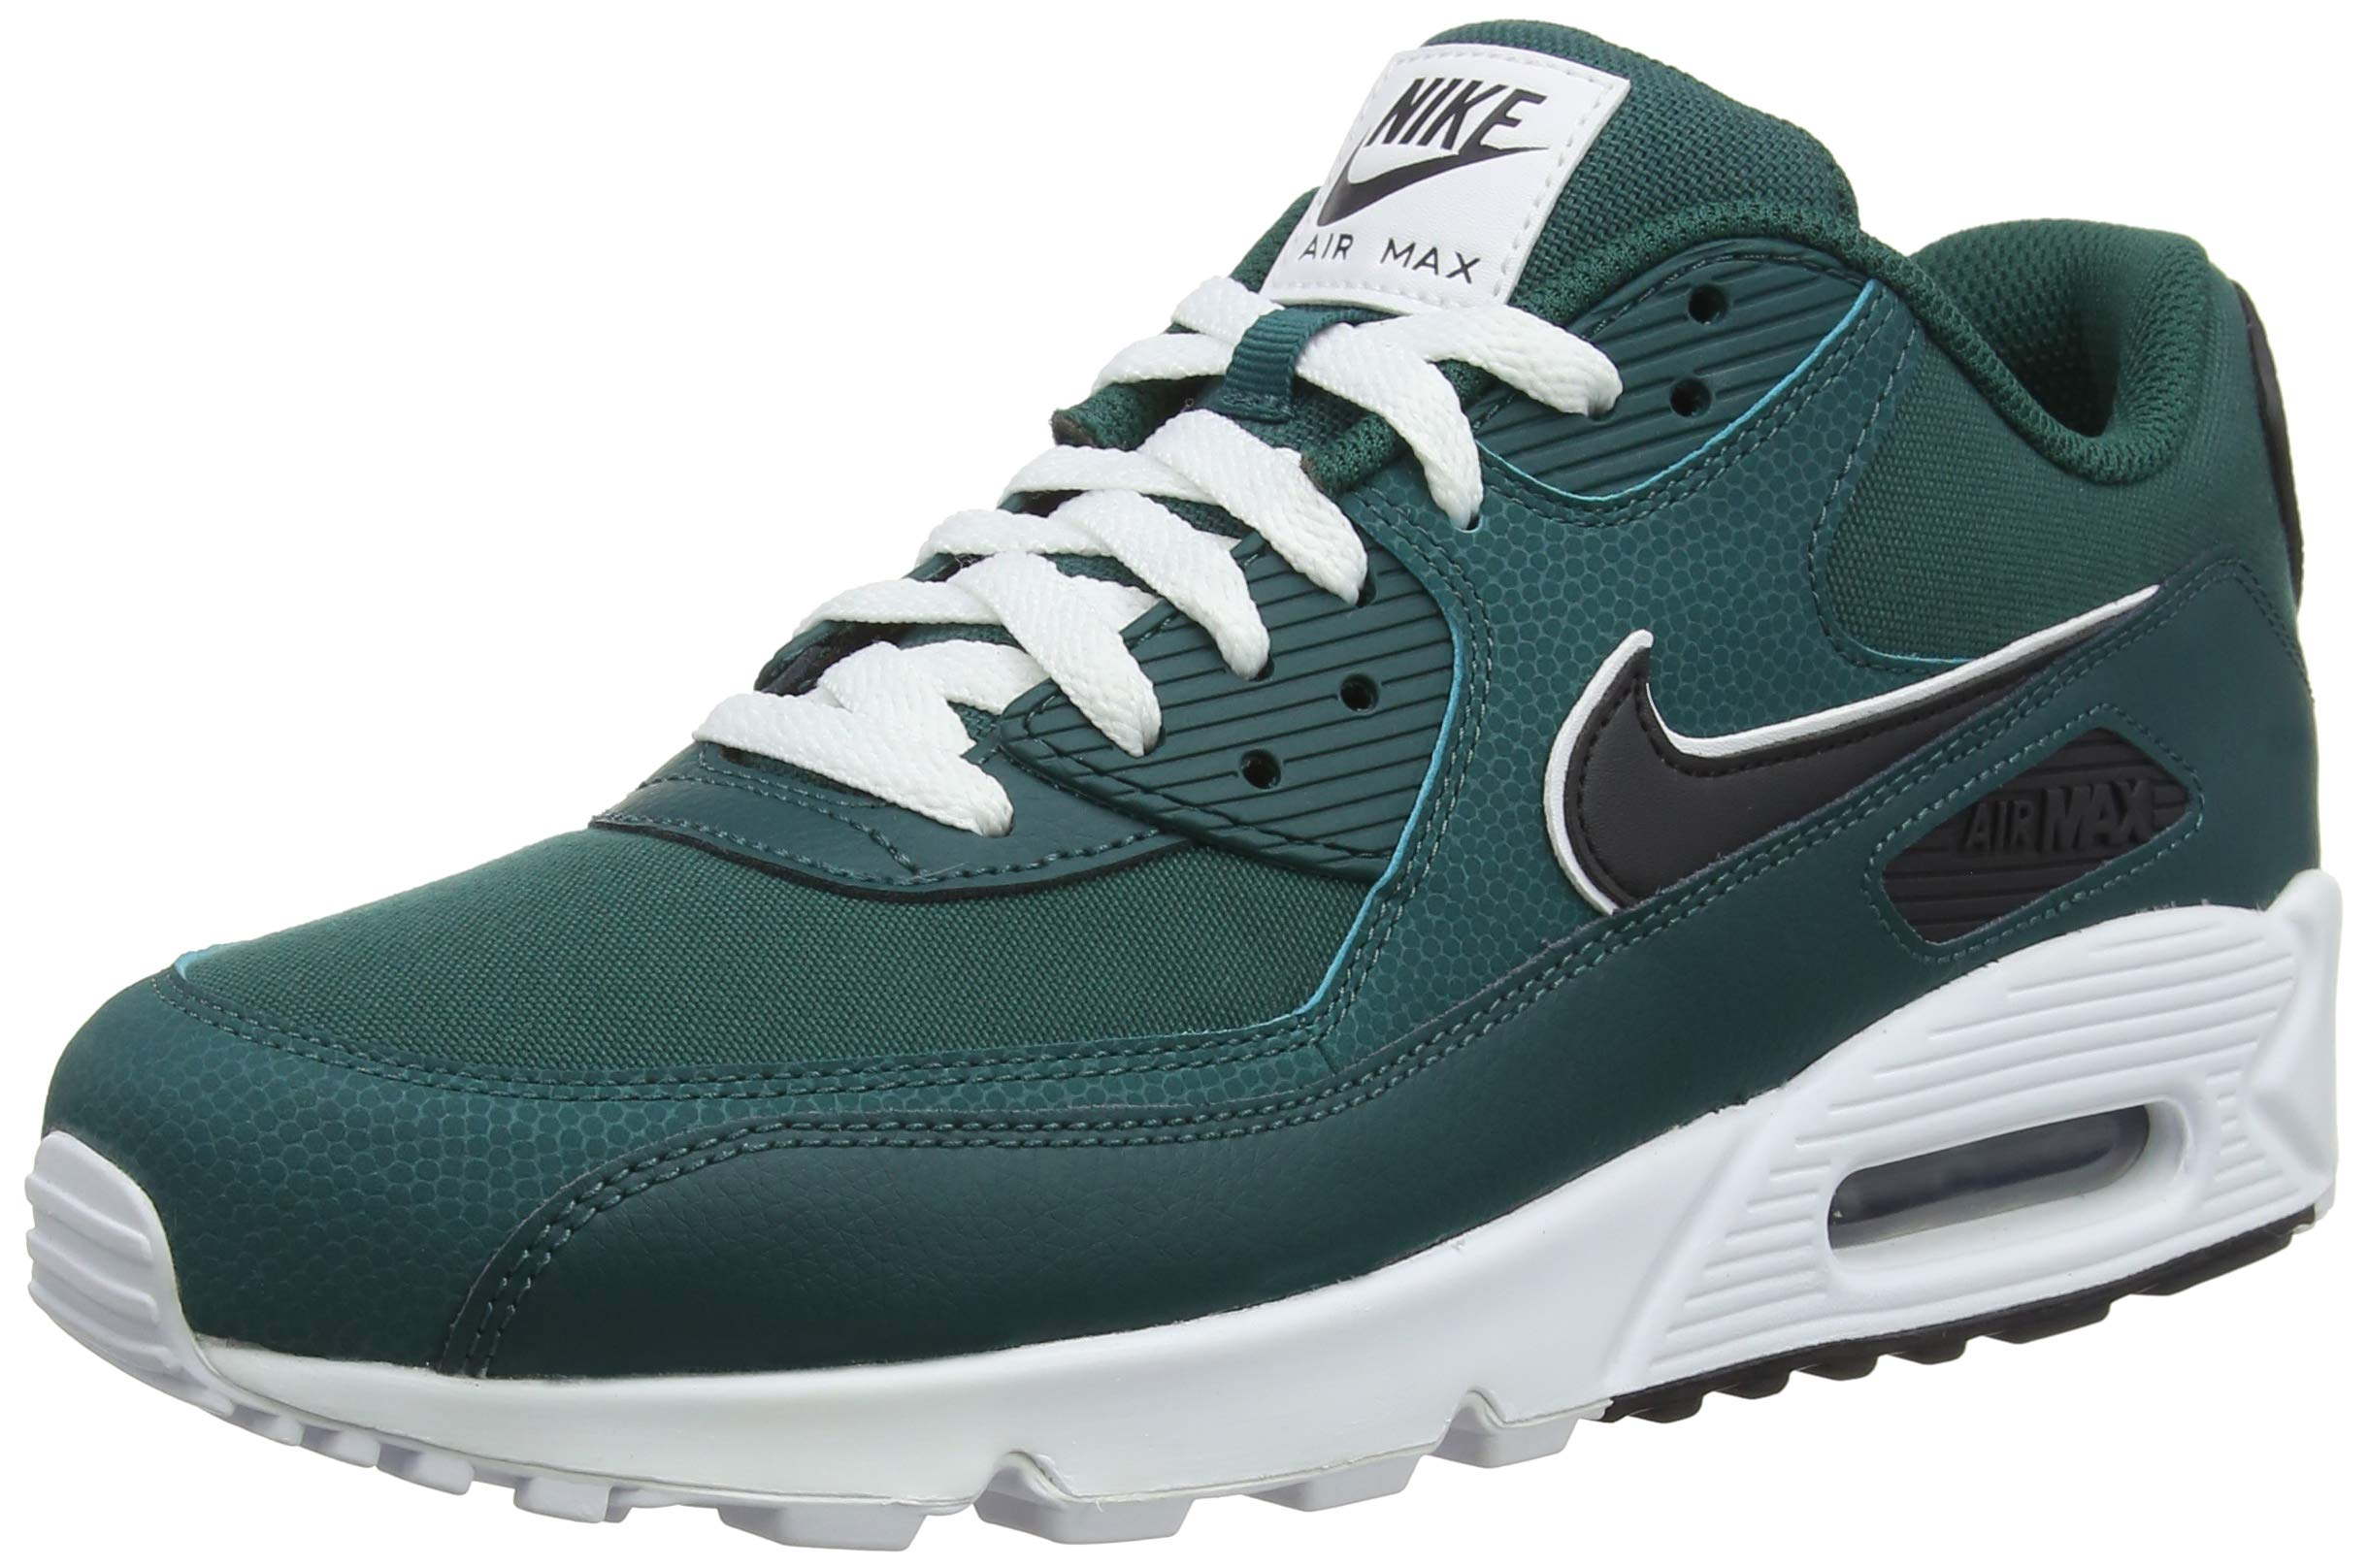 watch 4b355 d5640 Galleon - Nike Mens Air Max 90 Essential Running Shoes Rainforest Oil  Grey White AJ1285-301 Size 12